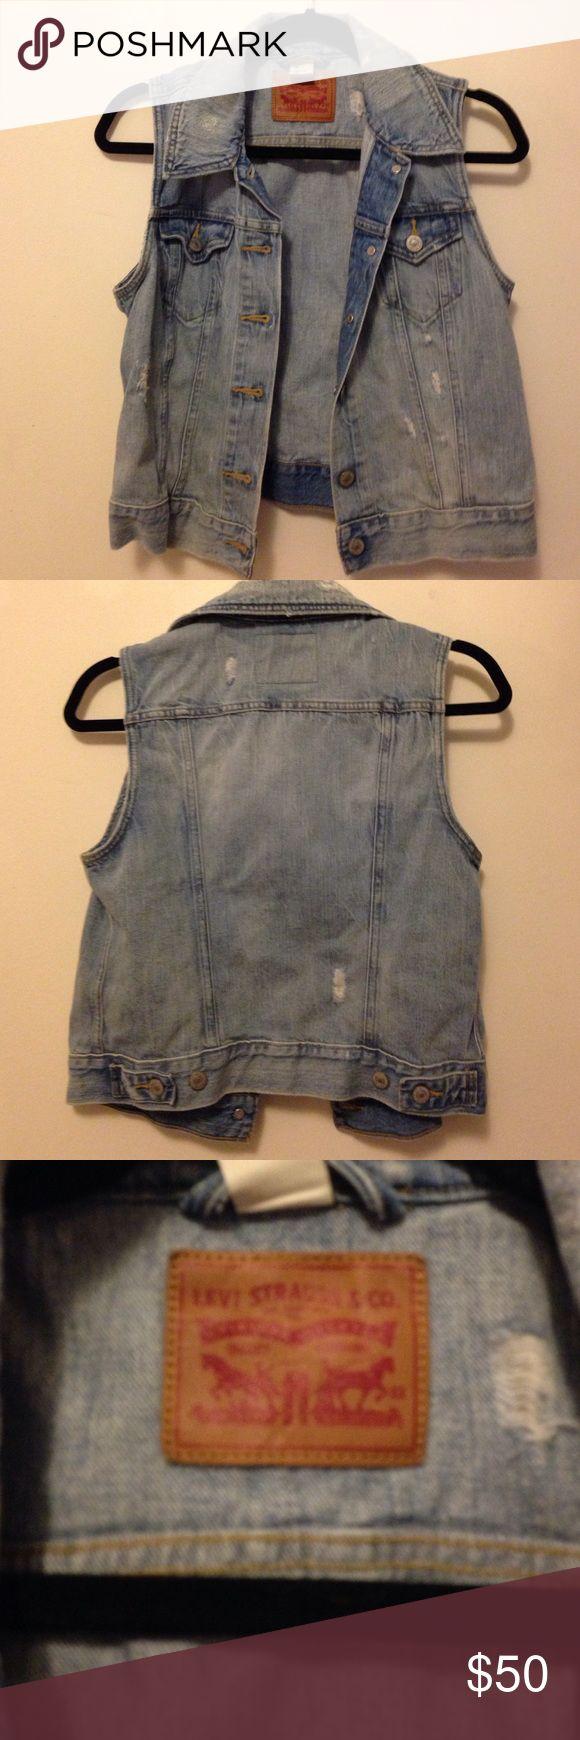 Levi Jean Jacket Vest Like new jean jacket. Perfect condition. Make me an offer! Levi's Jackets & Coats Jean Jackets